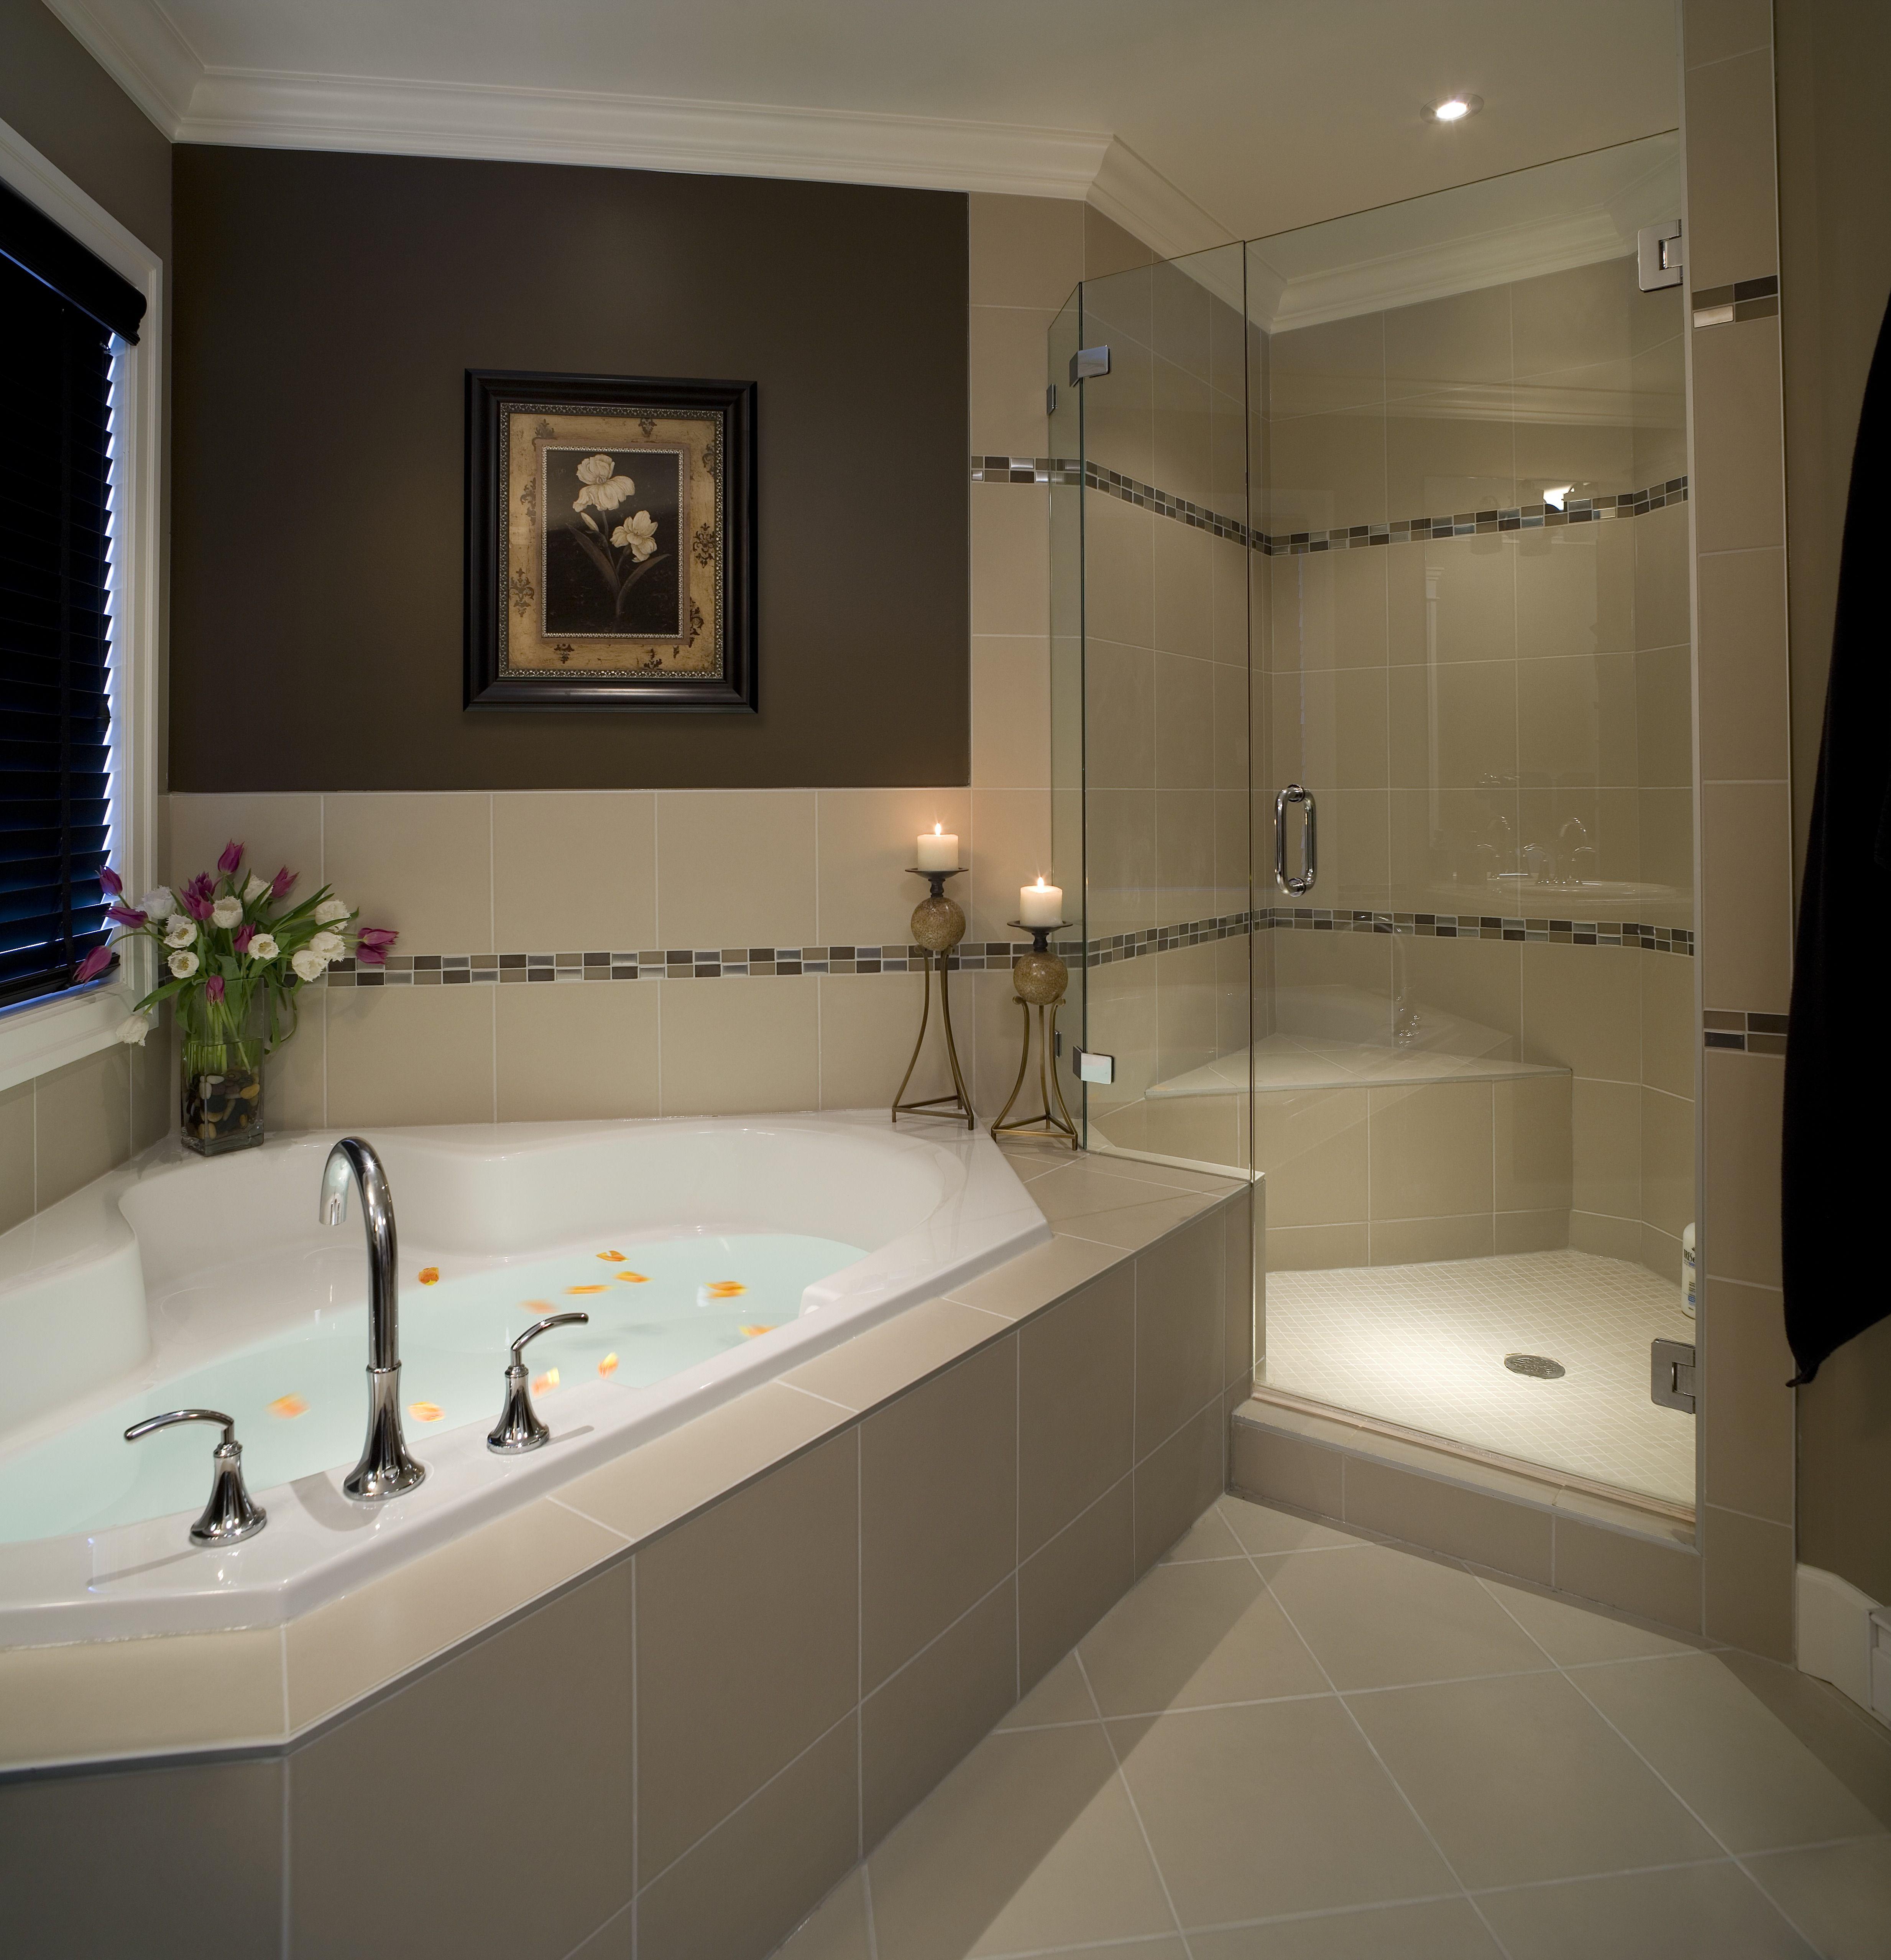 8 Master Bathrooms Every Couple Dreams Of Idee Salle De Bain